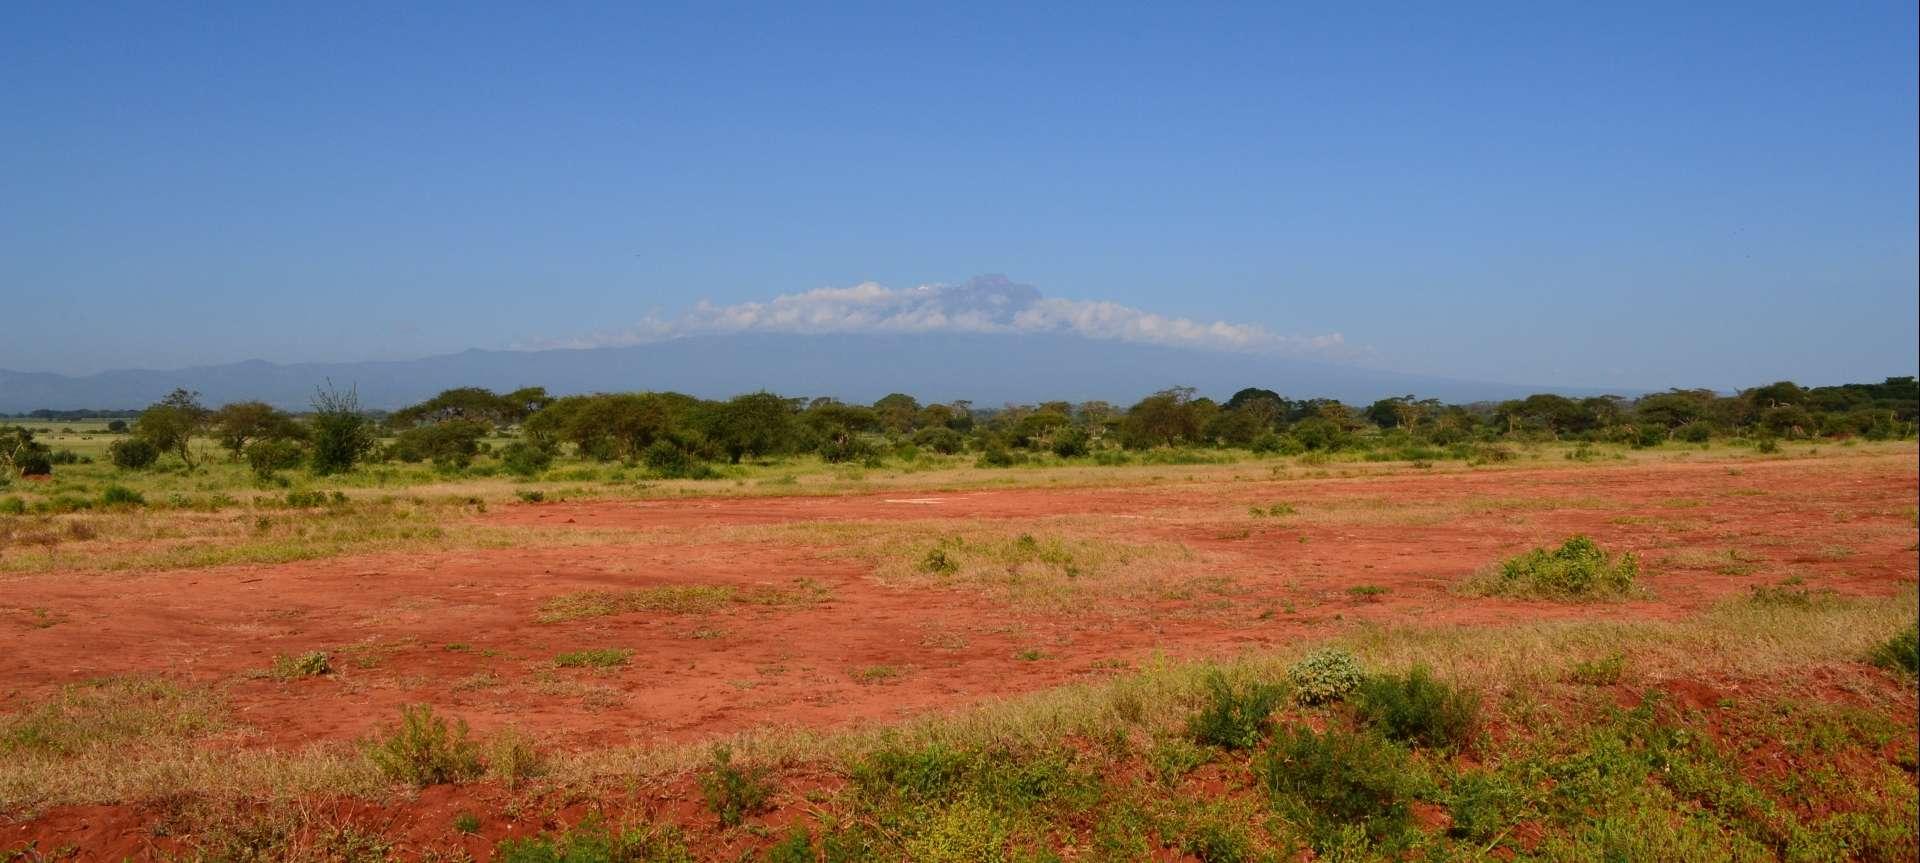 West Kilimanjaro - Africa Wildlife Safaris